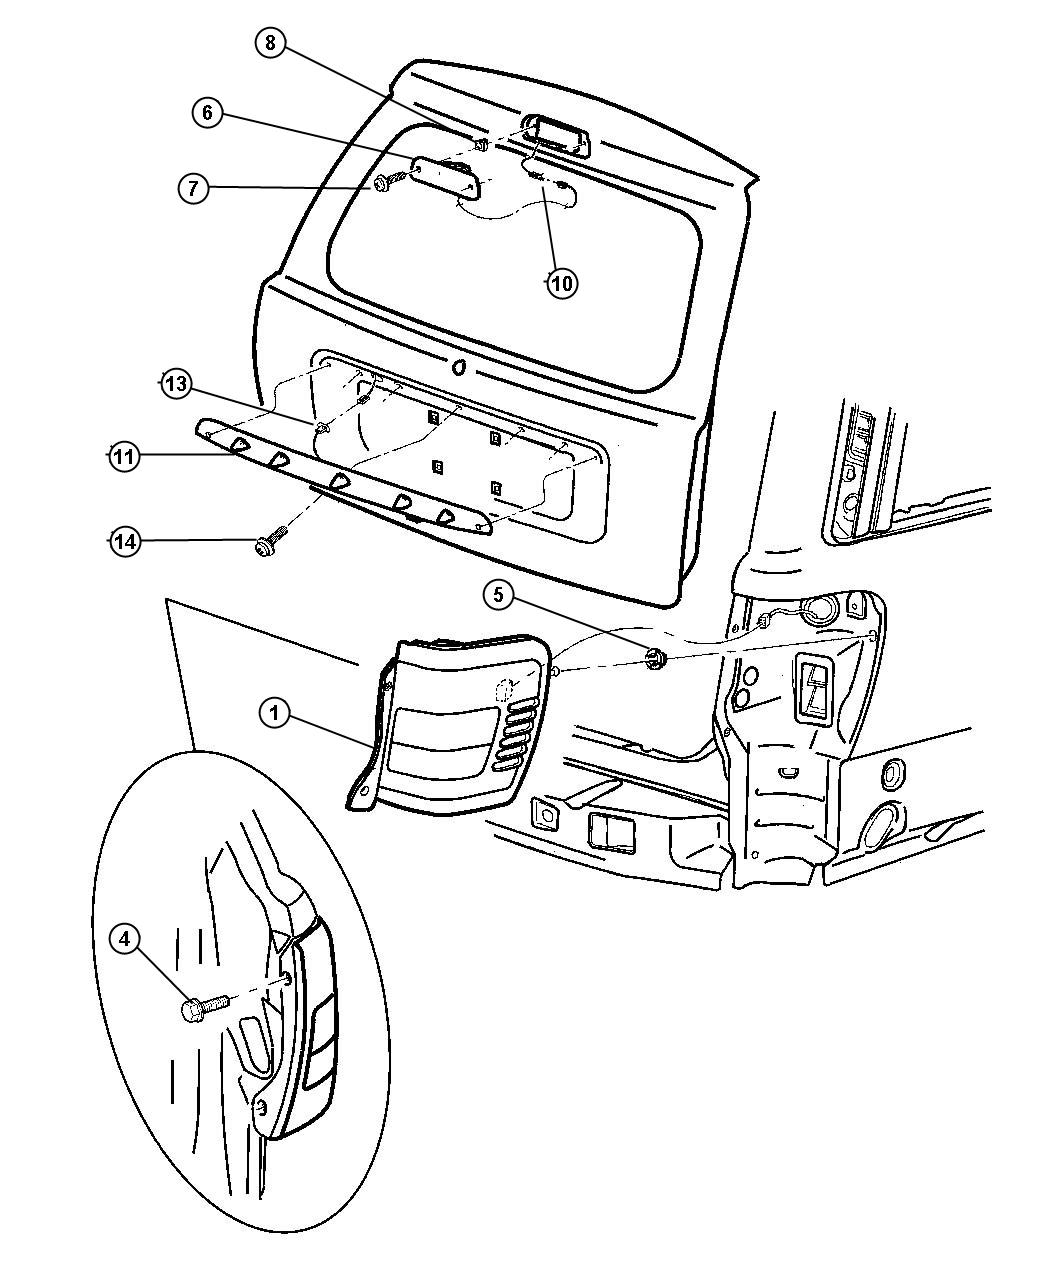 Focus St Tail Lamps | Wiring Diagram Database